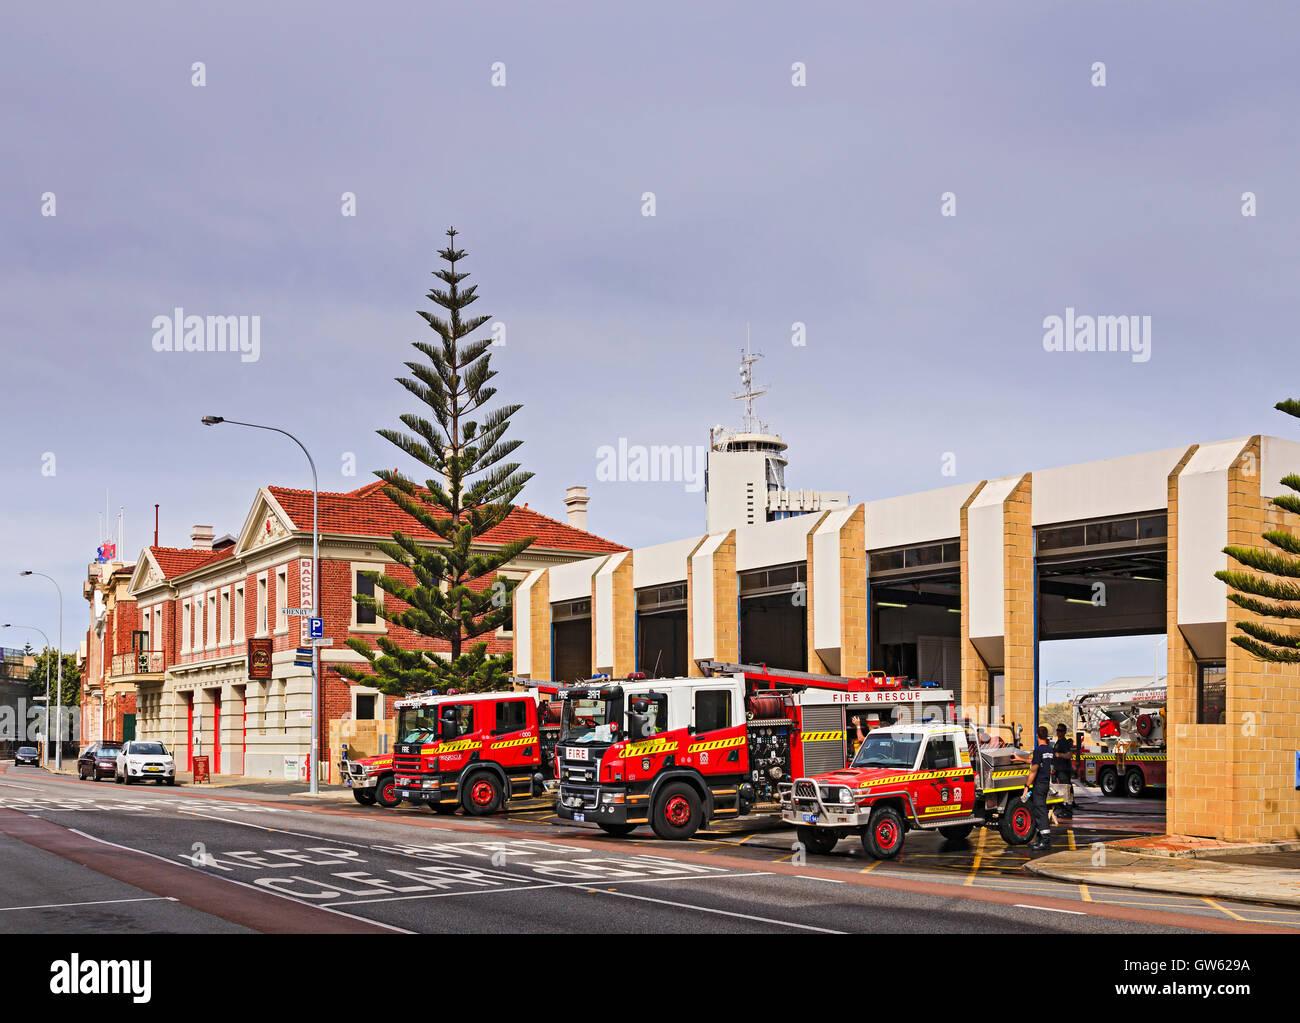 Fremantle, Western Australia, Australia - January 16, 2016: Fremantle fire brigades outside of fire station ready - Stock Image